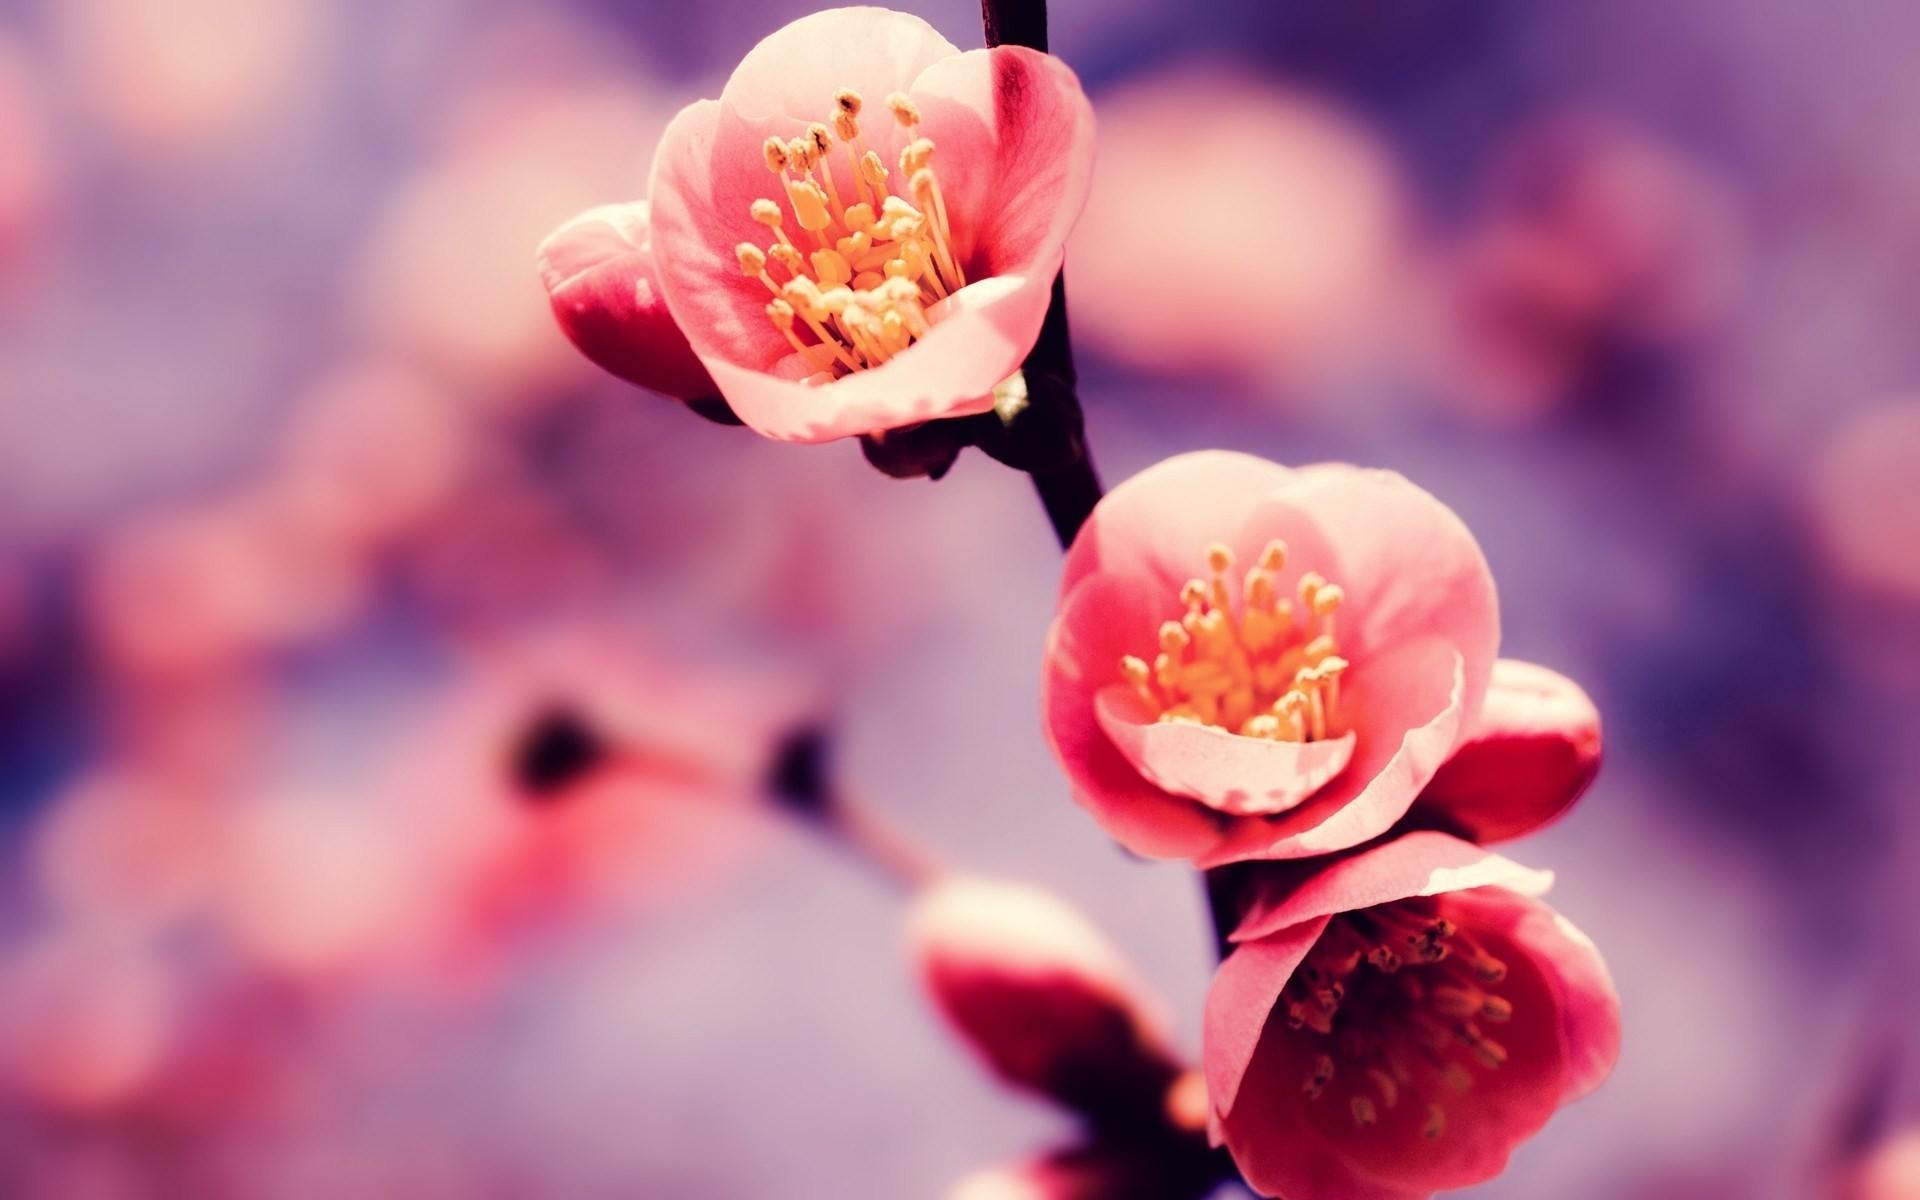 blossom cherry blossom tree wallpaper cherry blossom wallpaper hd .